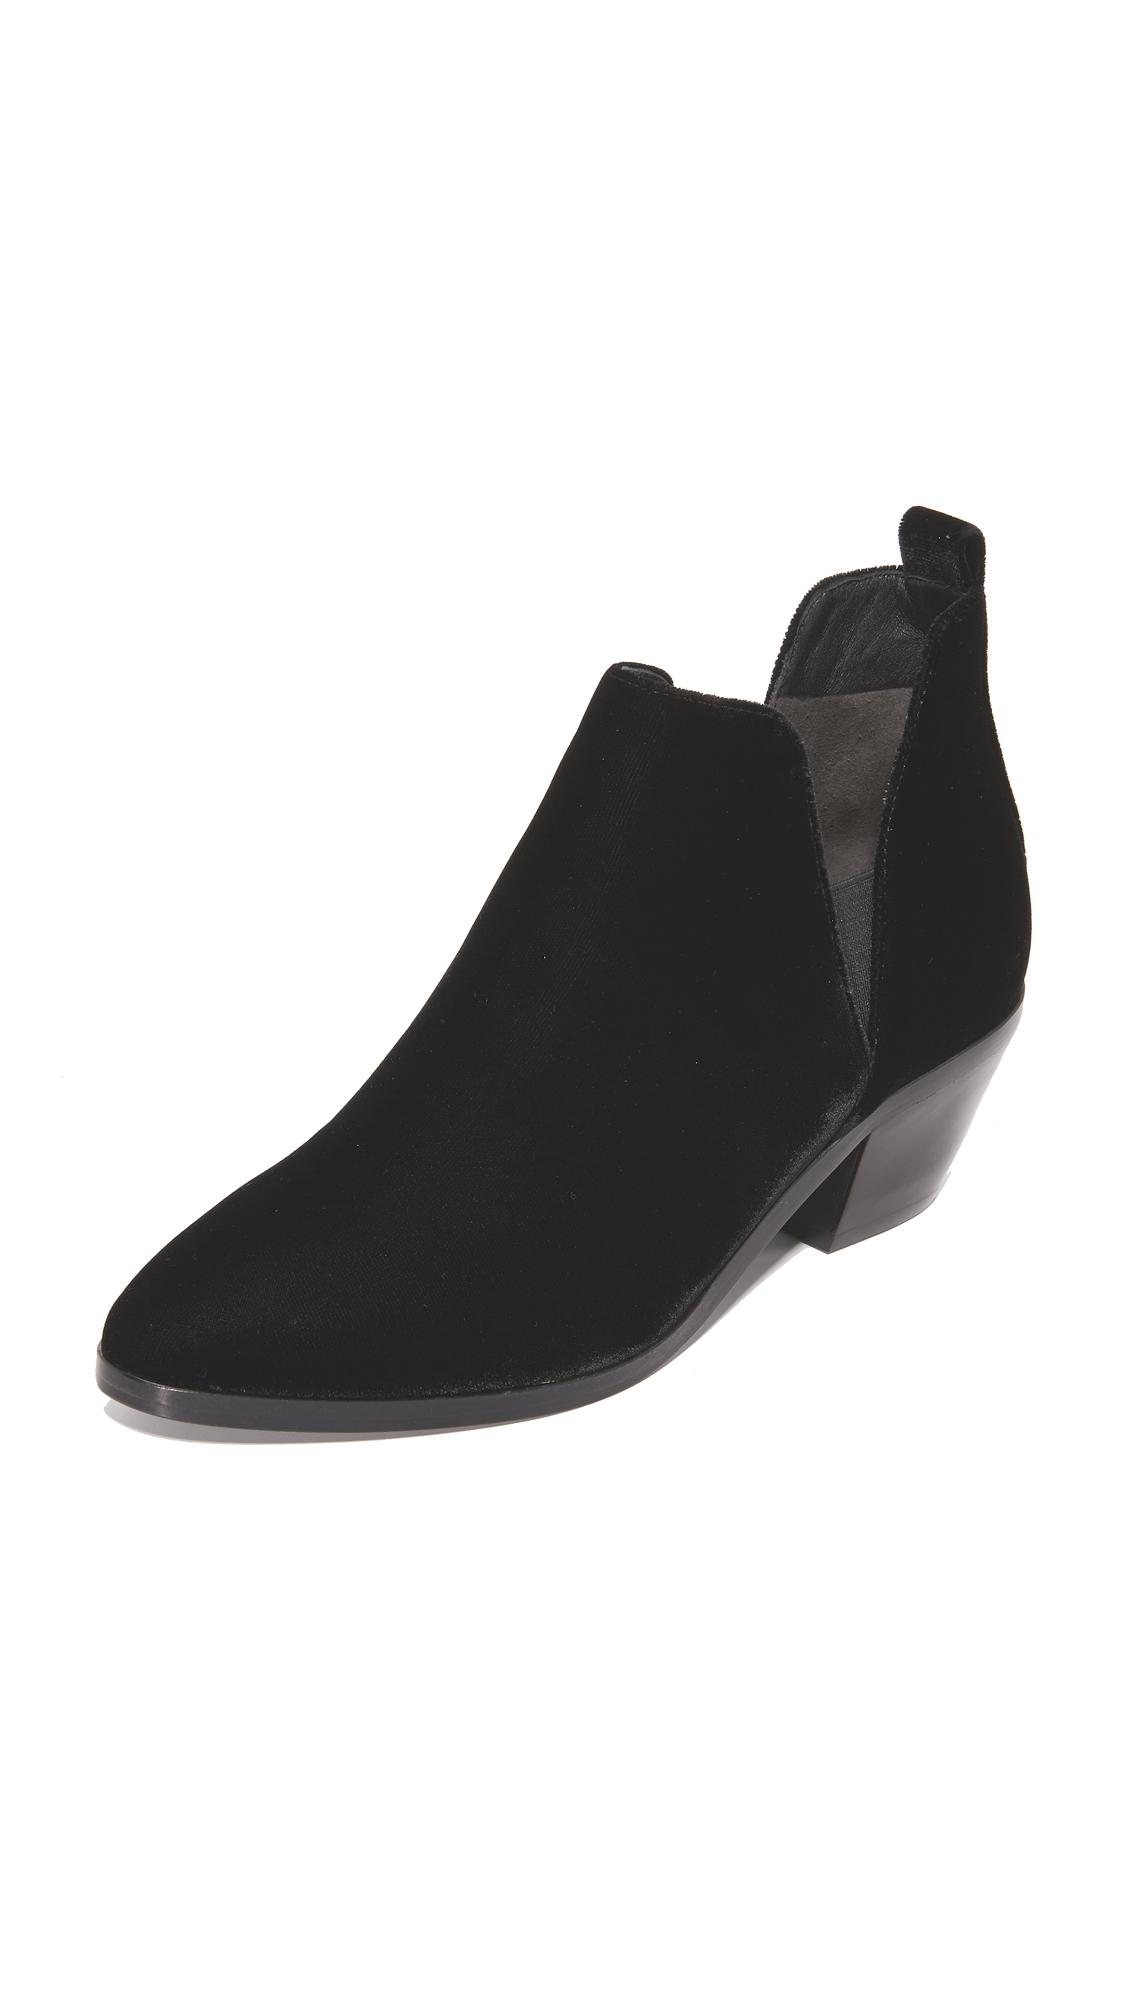 Sigerson Morrison Belin Velvet Booties - Black